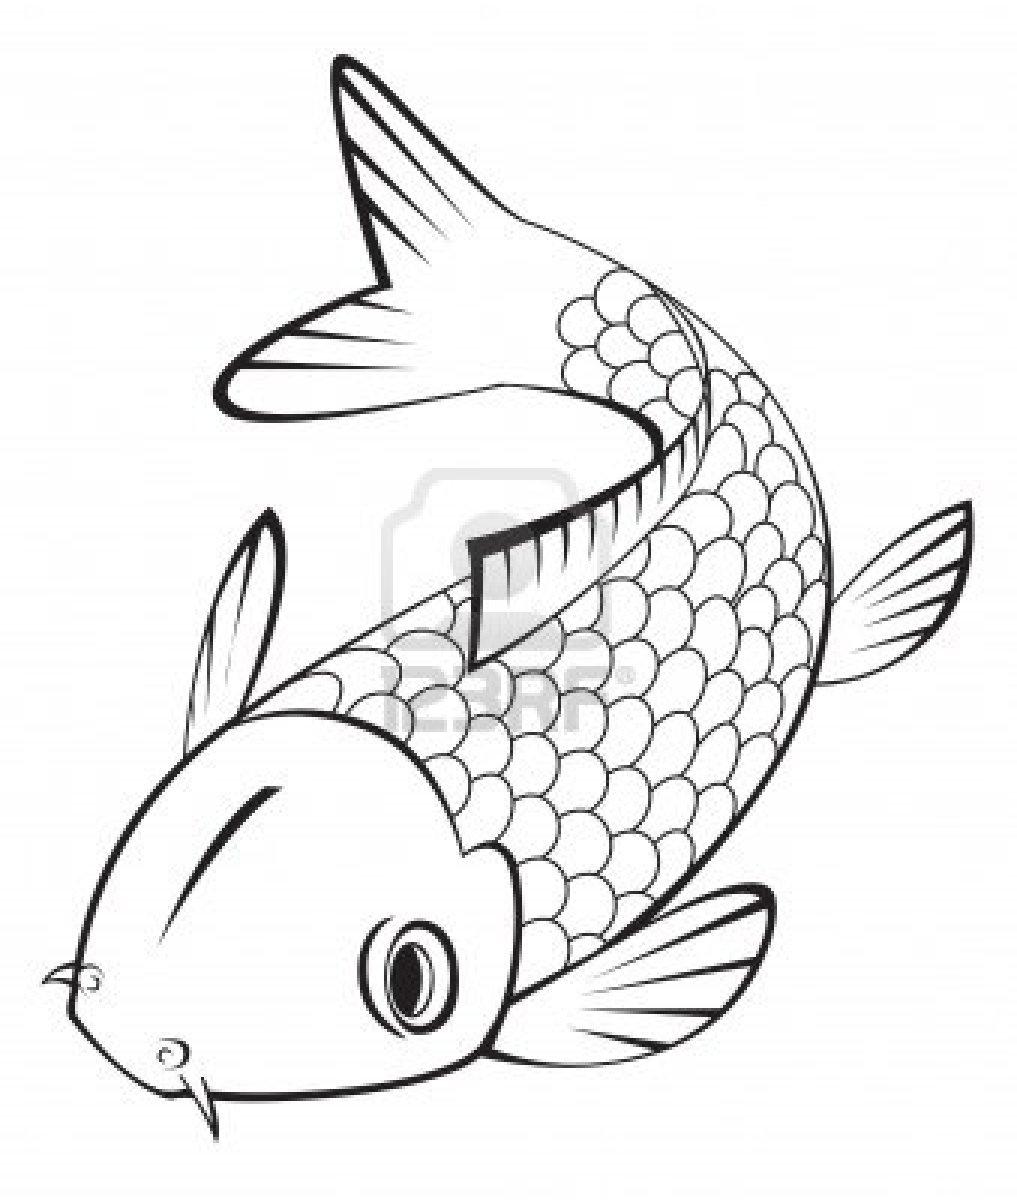 Line Drawing Koi Fish : Koi fish drawing clipart best